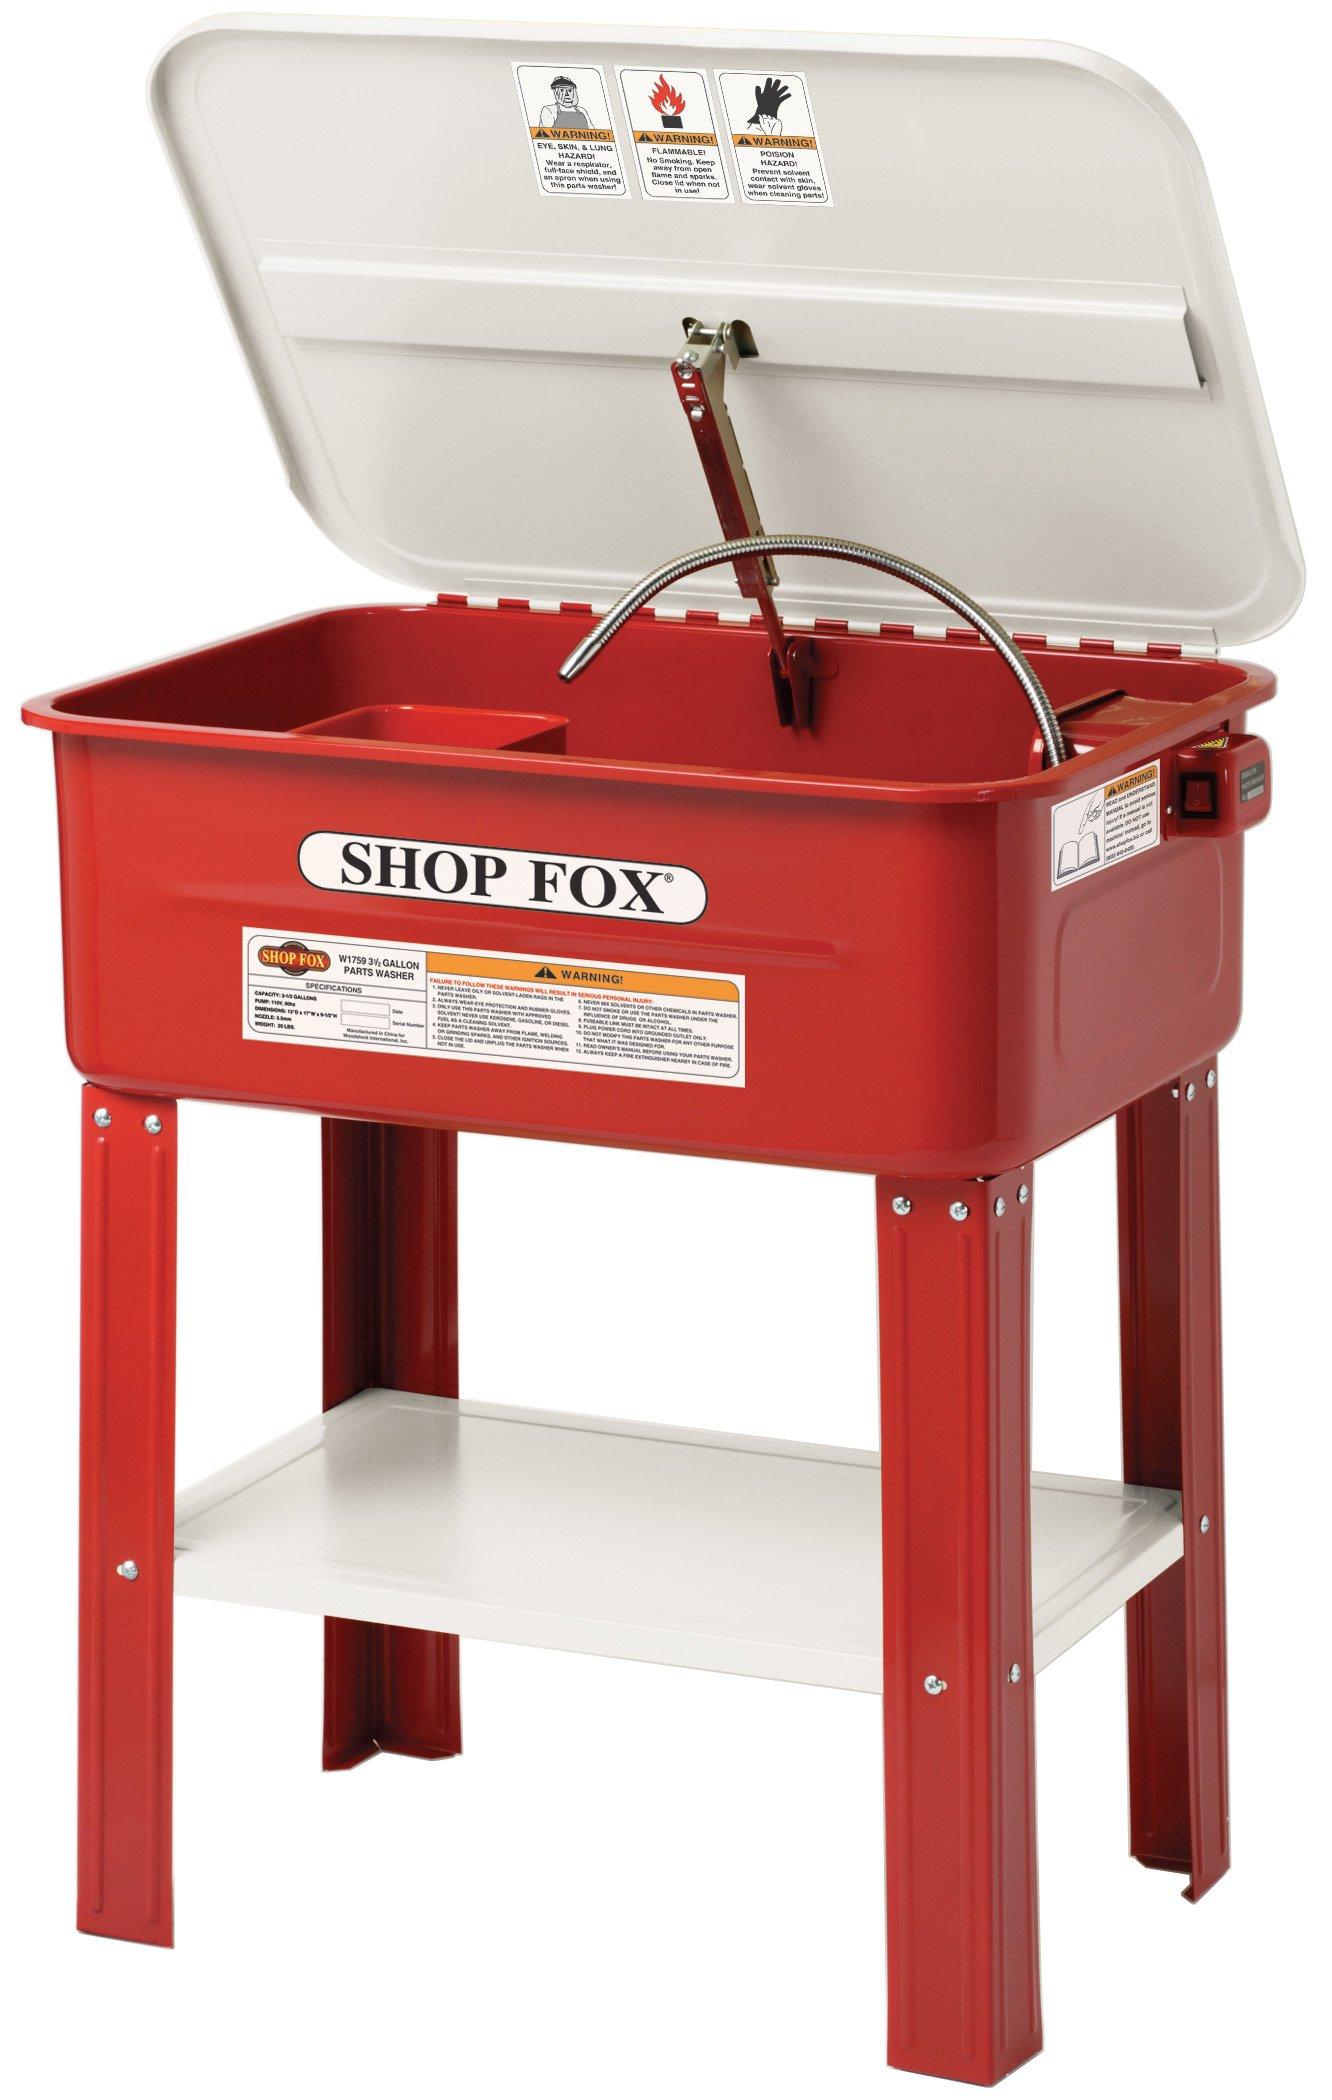 Shop Fox W1760 20 Gallon Parts Washer